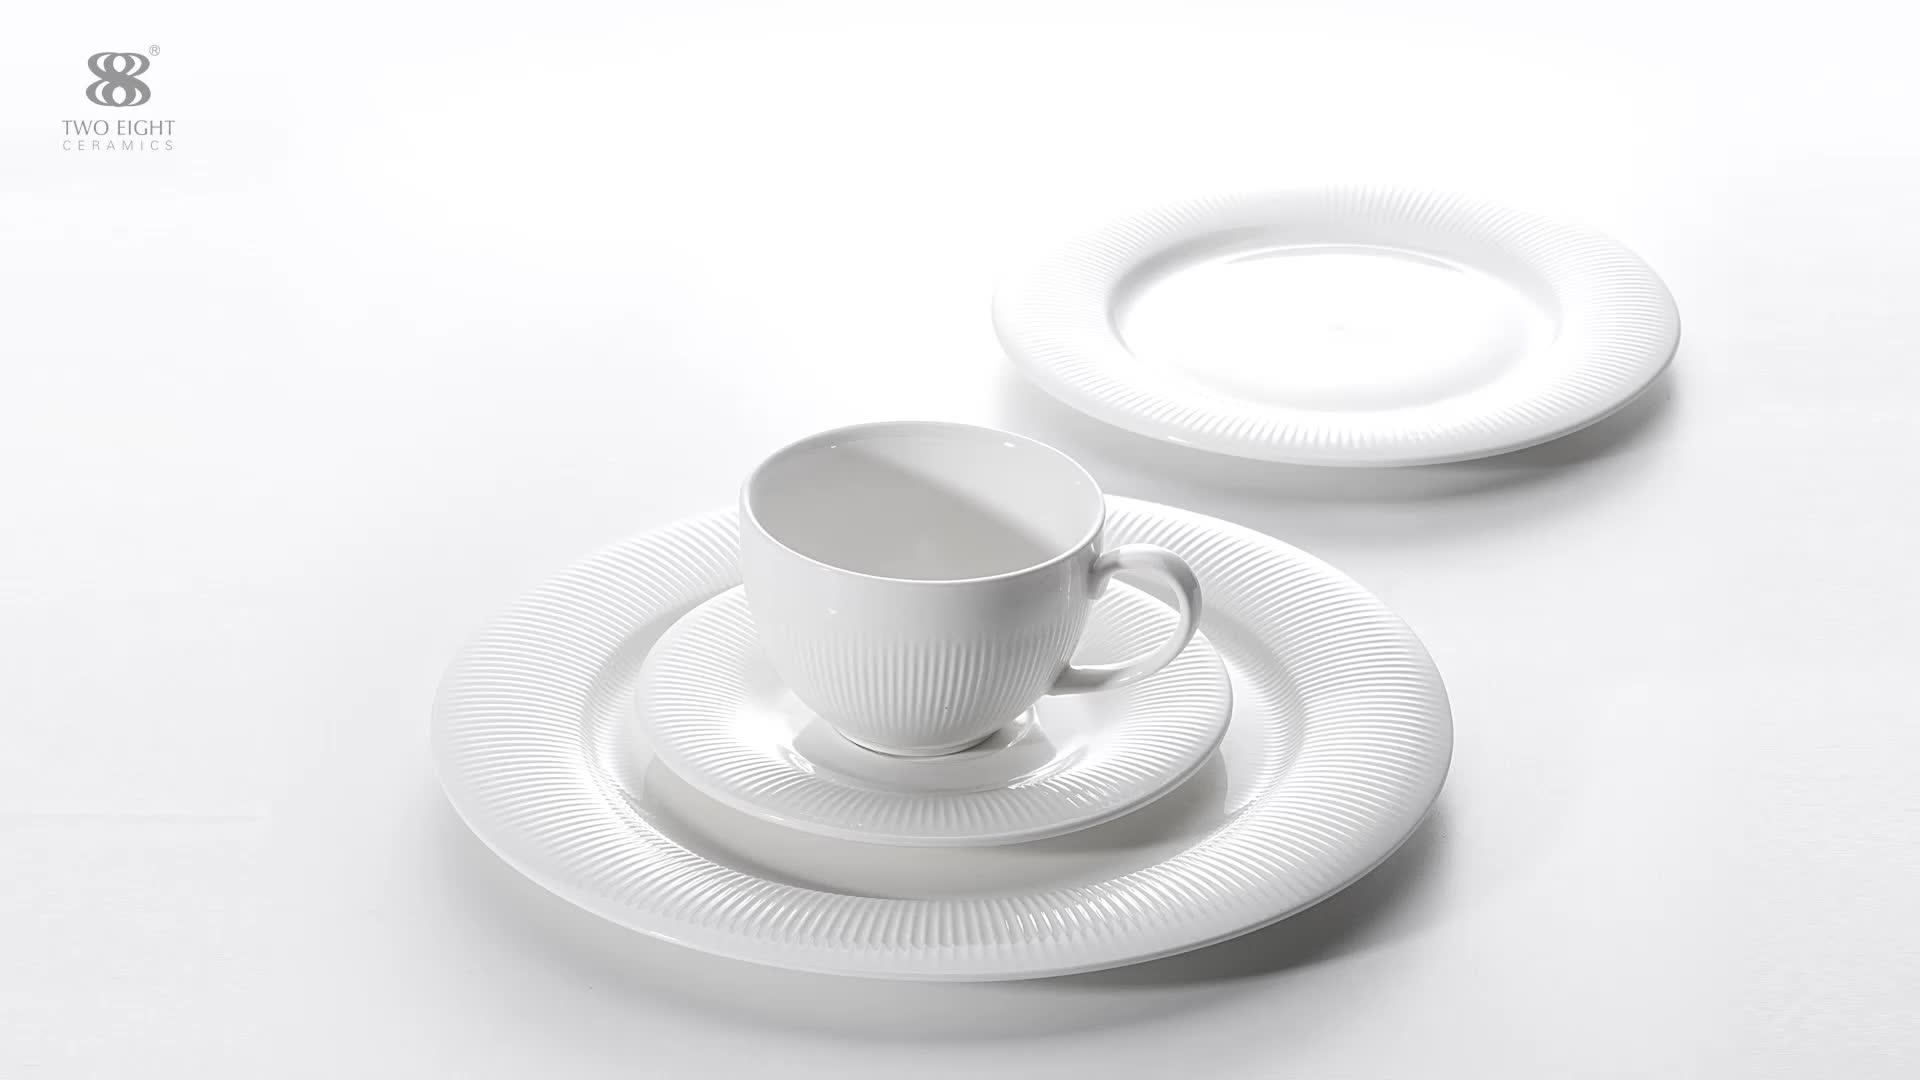 2019 Hot High Quality Durable Hotel Dinnerware, English Style Porcelain Dinnerware Set, Design Your Own Porcelain Dinnerware